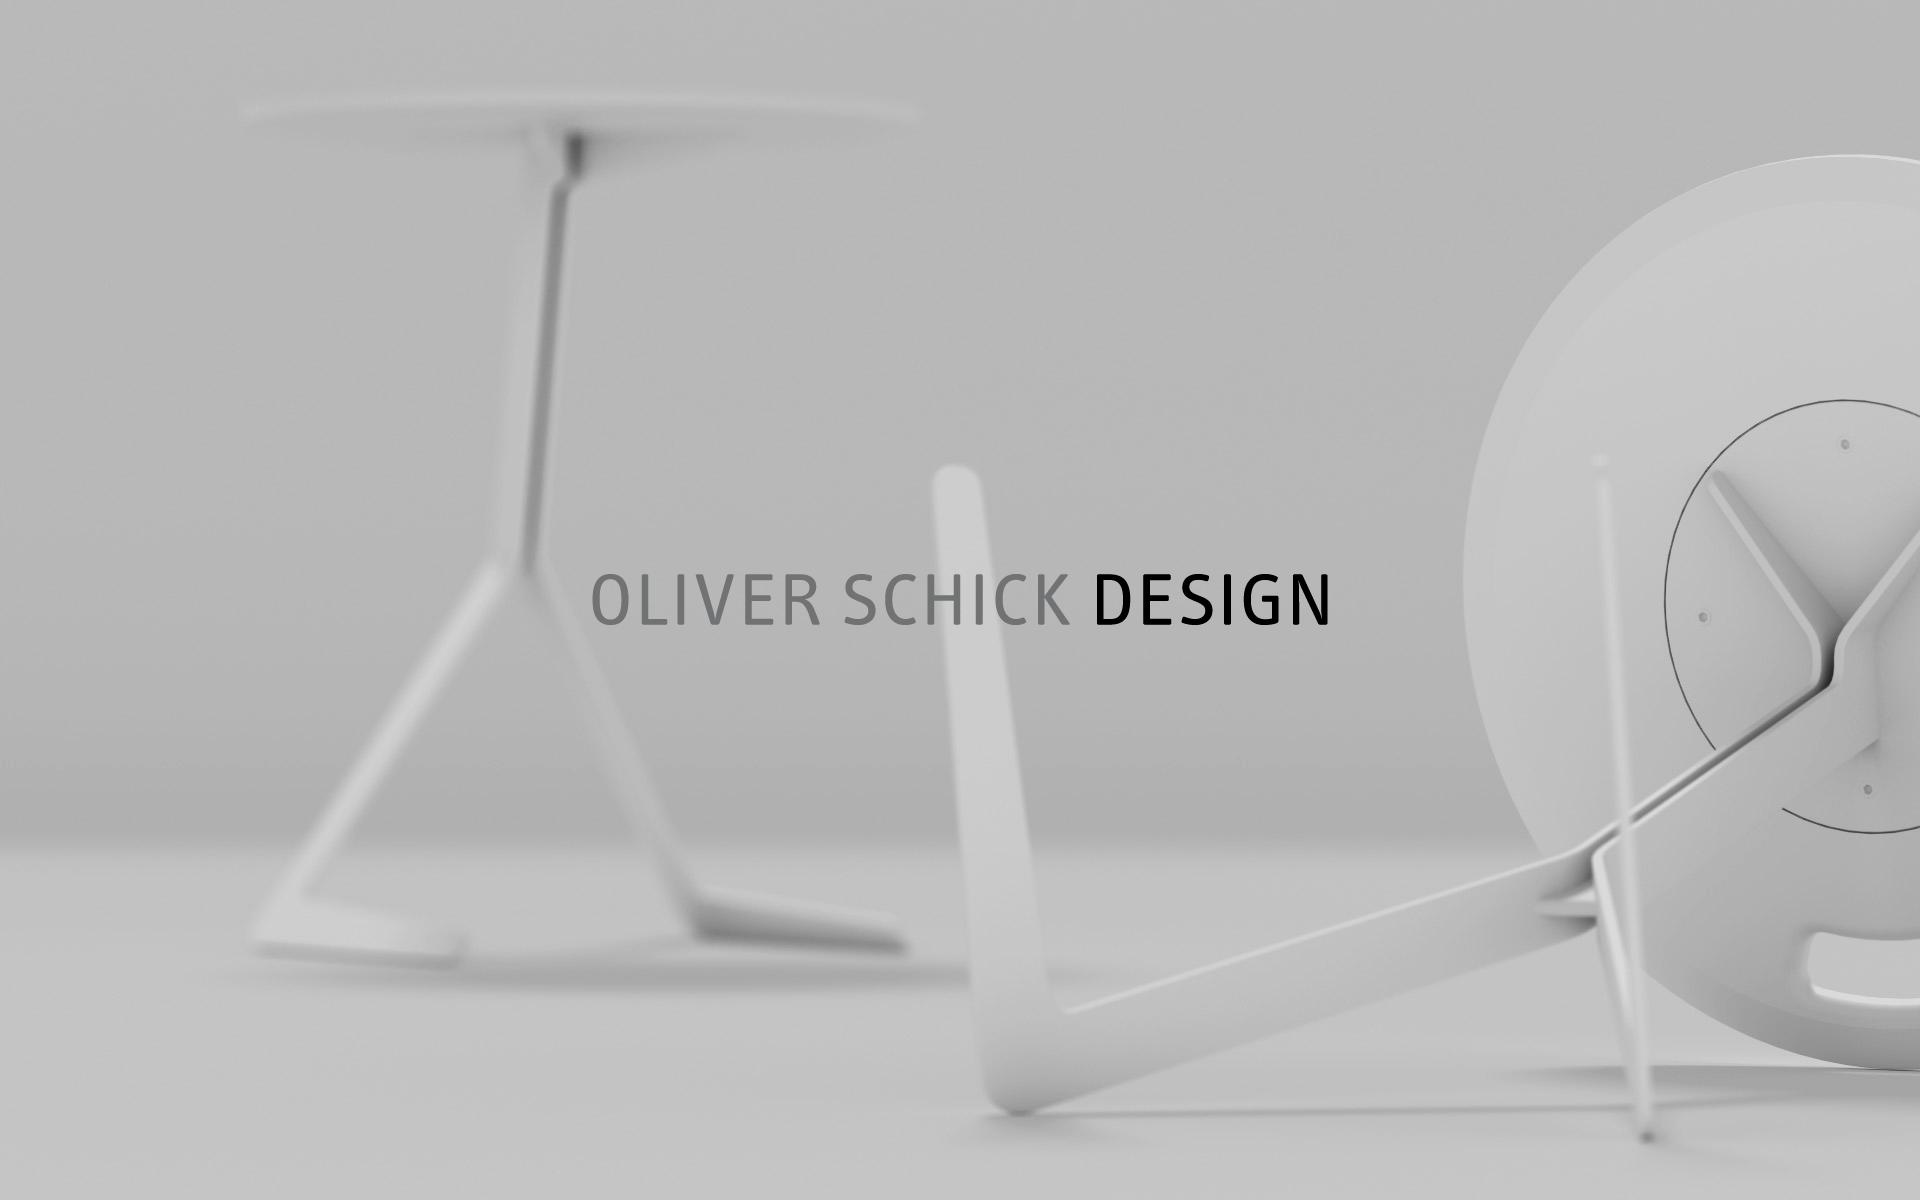 Oliver schick design offenbach am main for Offenbach design